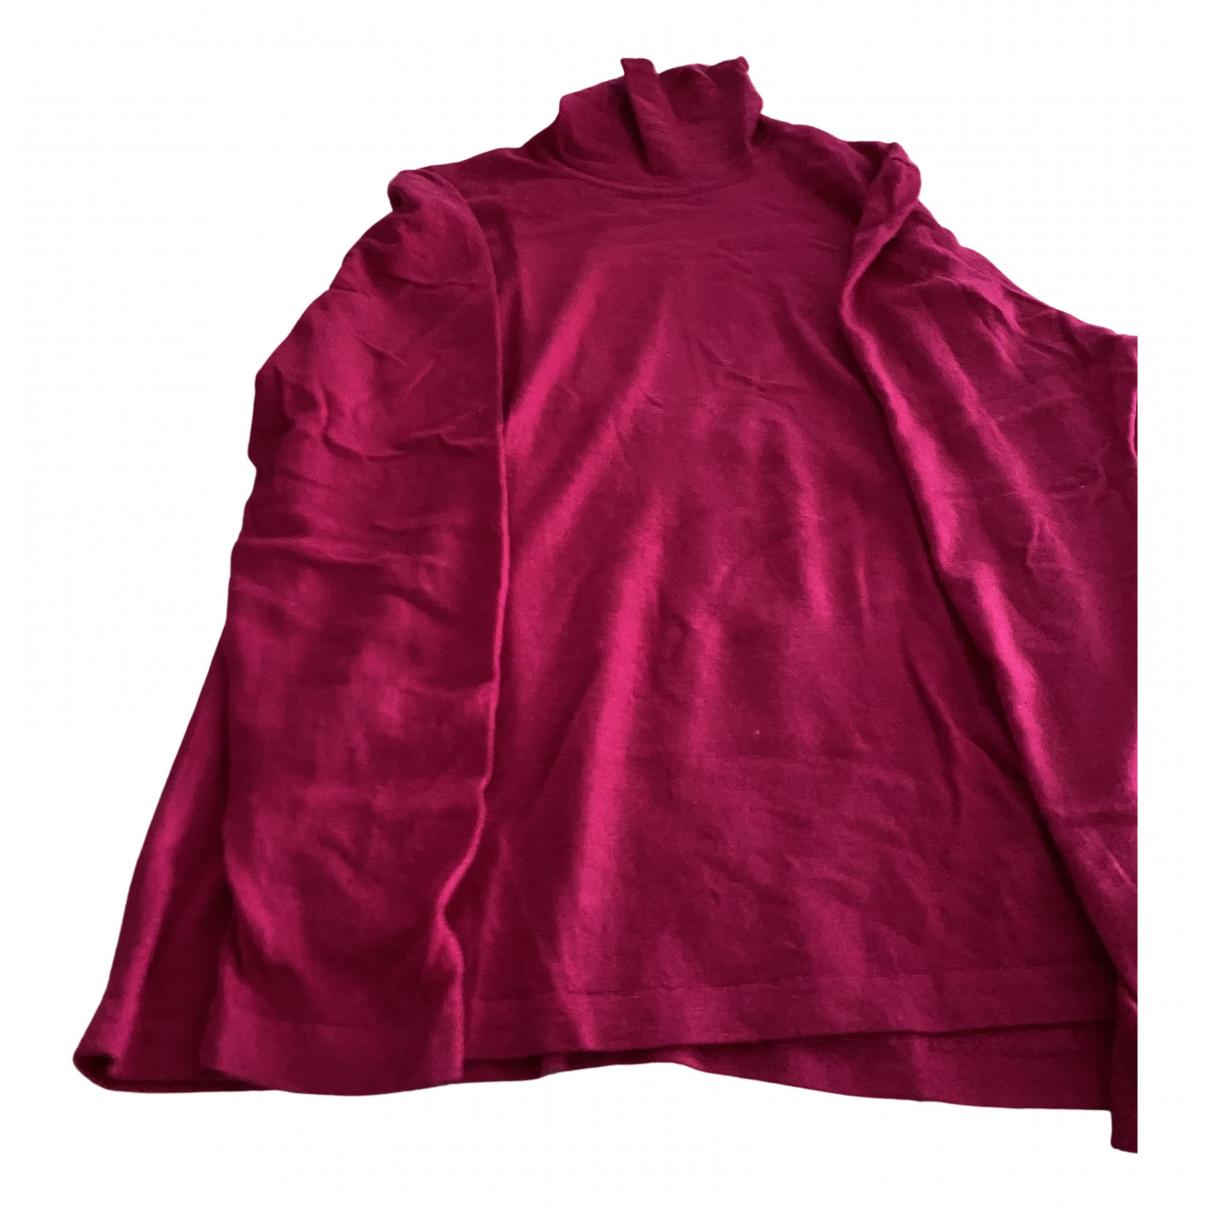 Yves Saint Laurent - Pull   pour femme en cachemire - rose